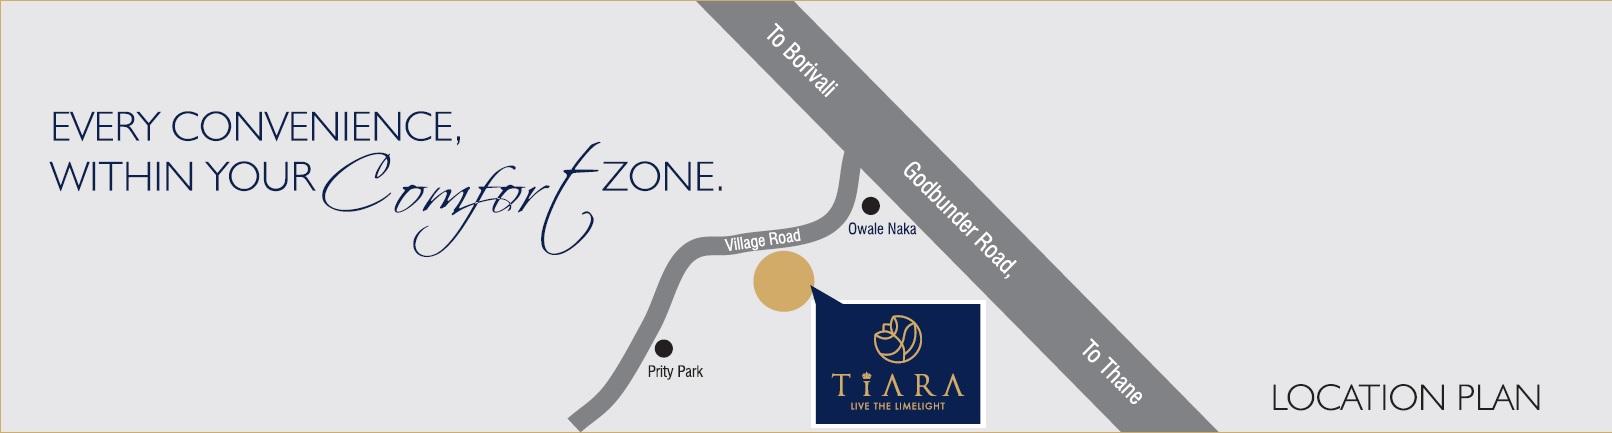 jvm tiara location image1